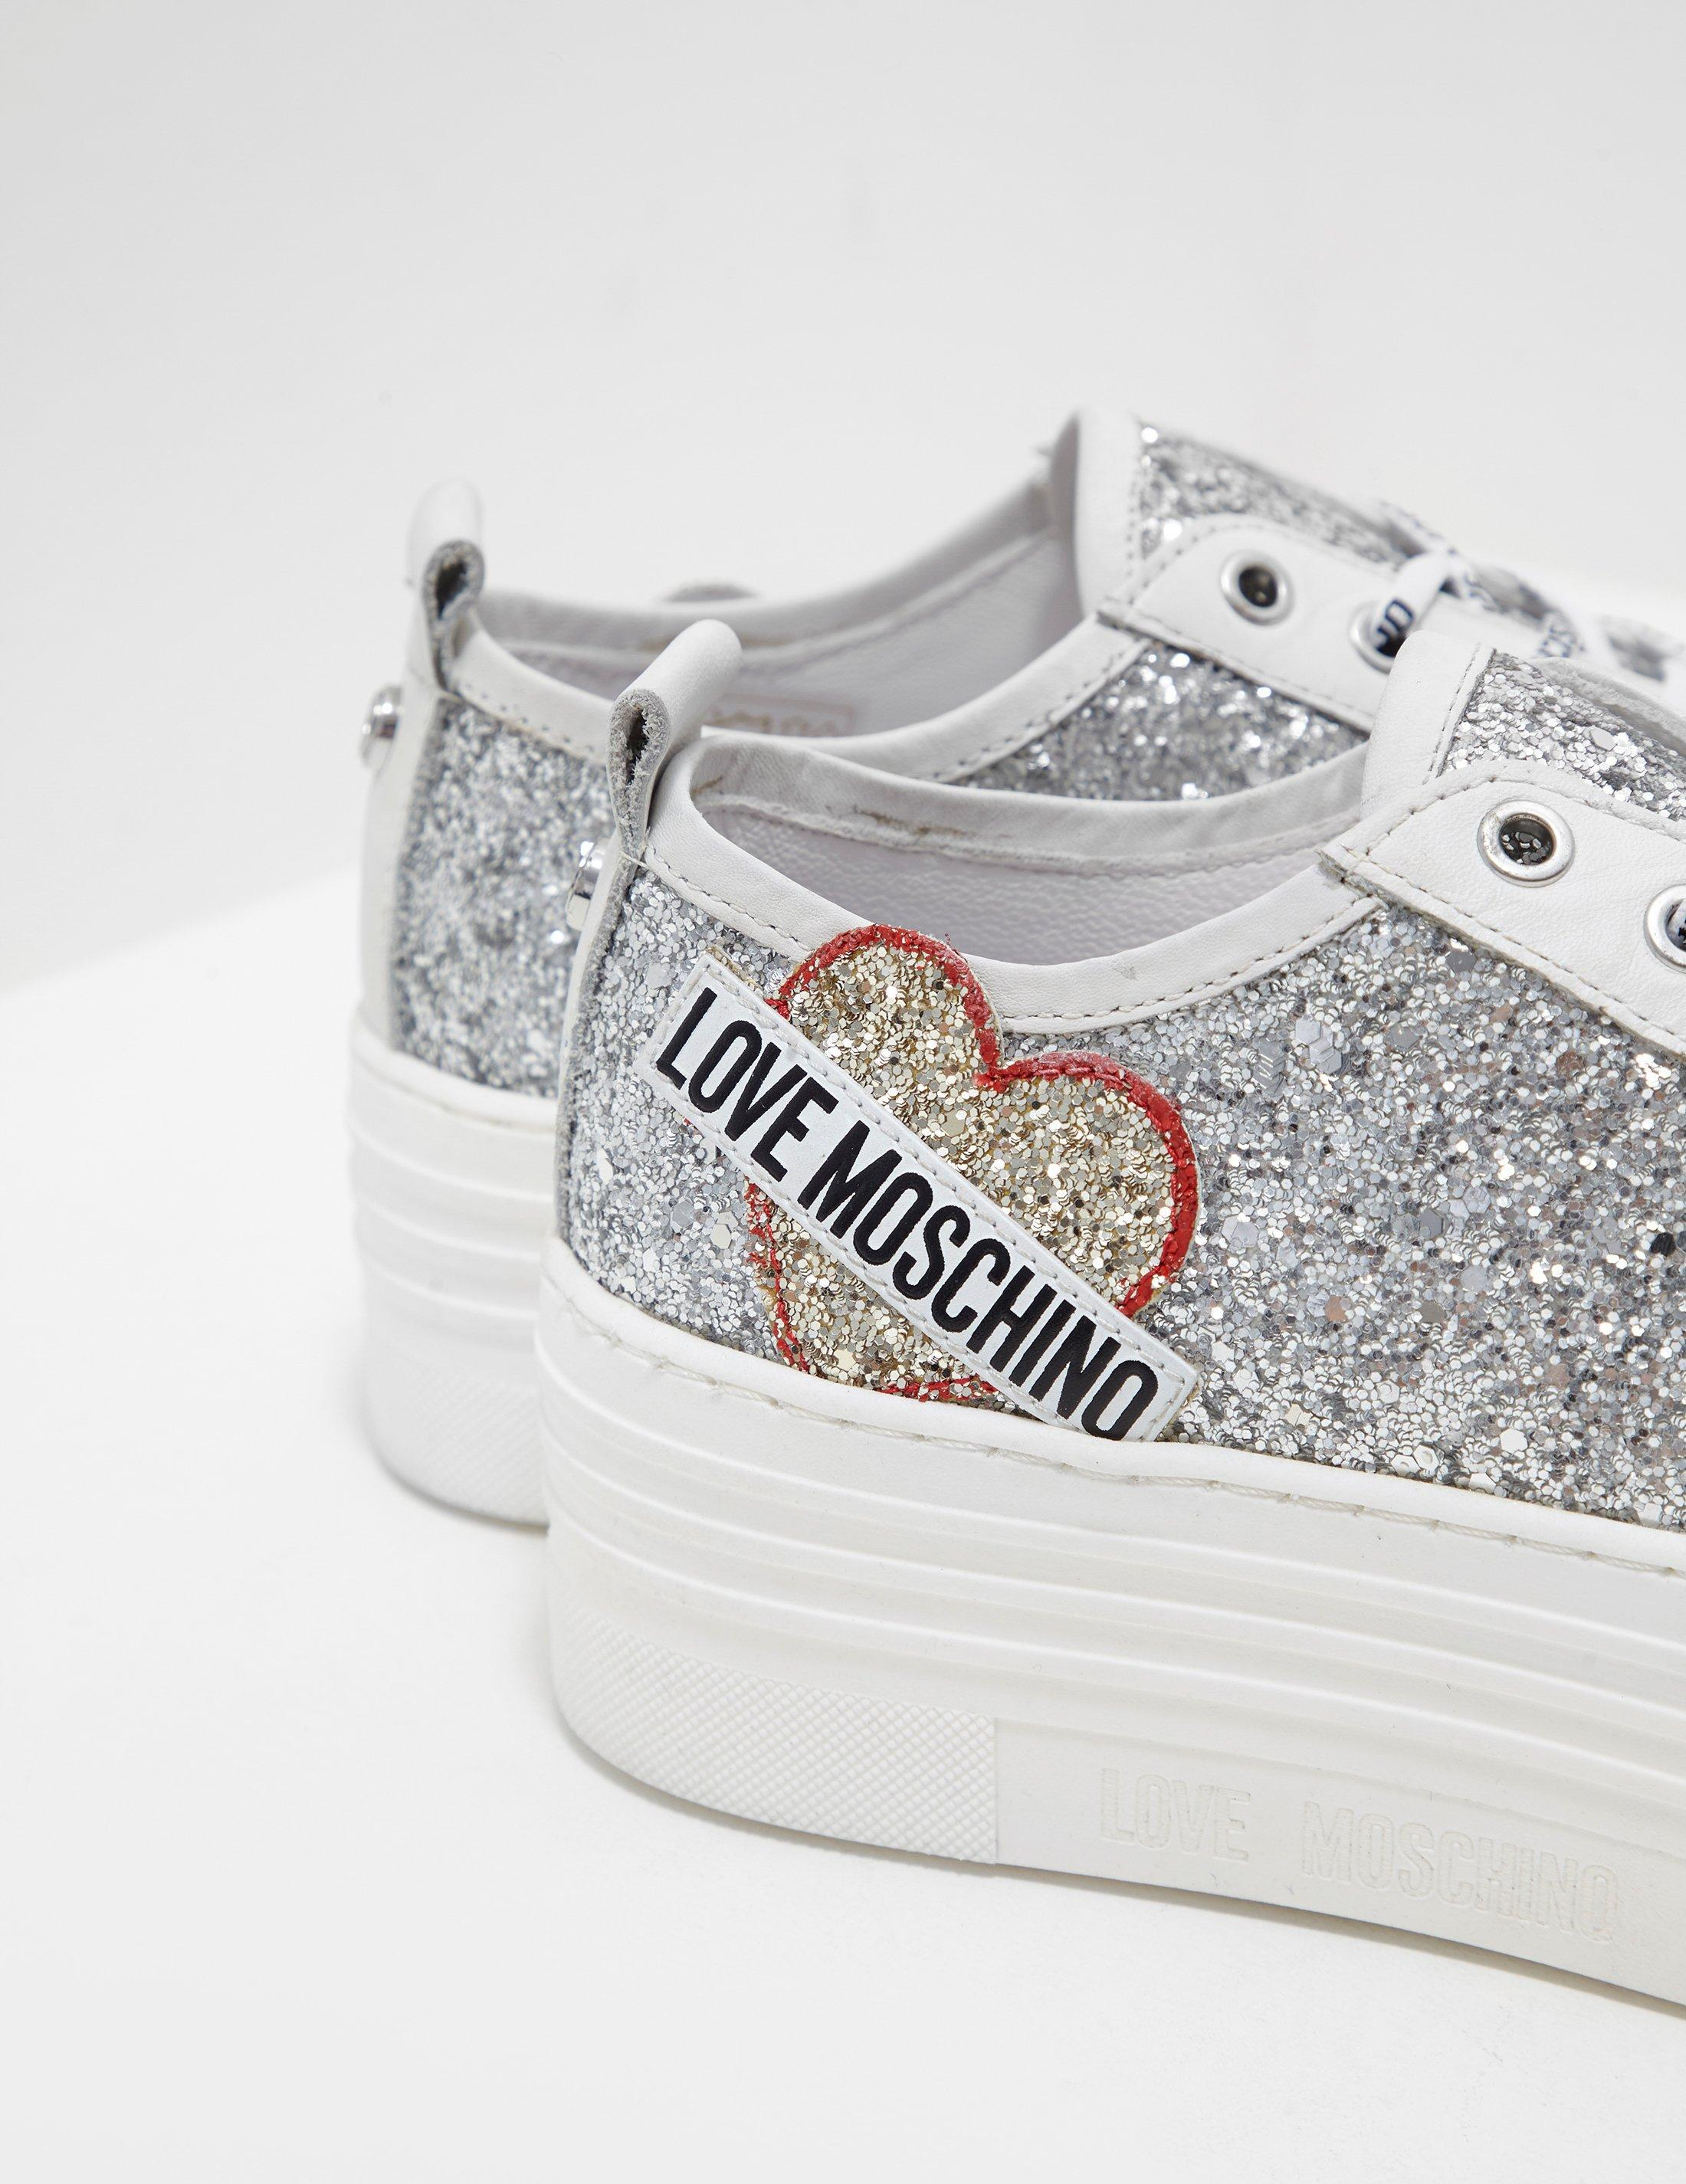 5dfdbf60e3b Lyst - Love Moschino Womens Glitter Platform Trainers Silver in Metallic